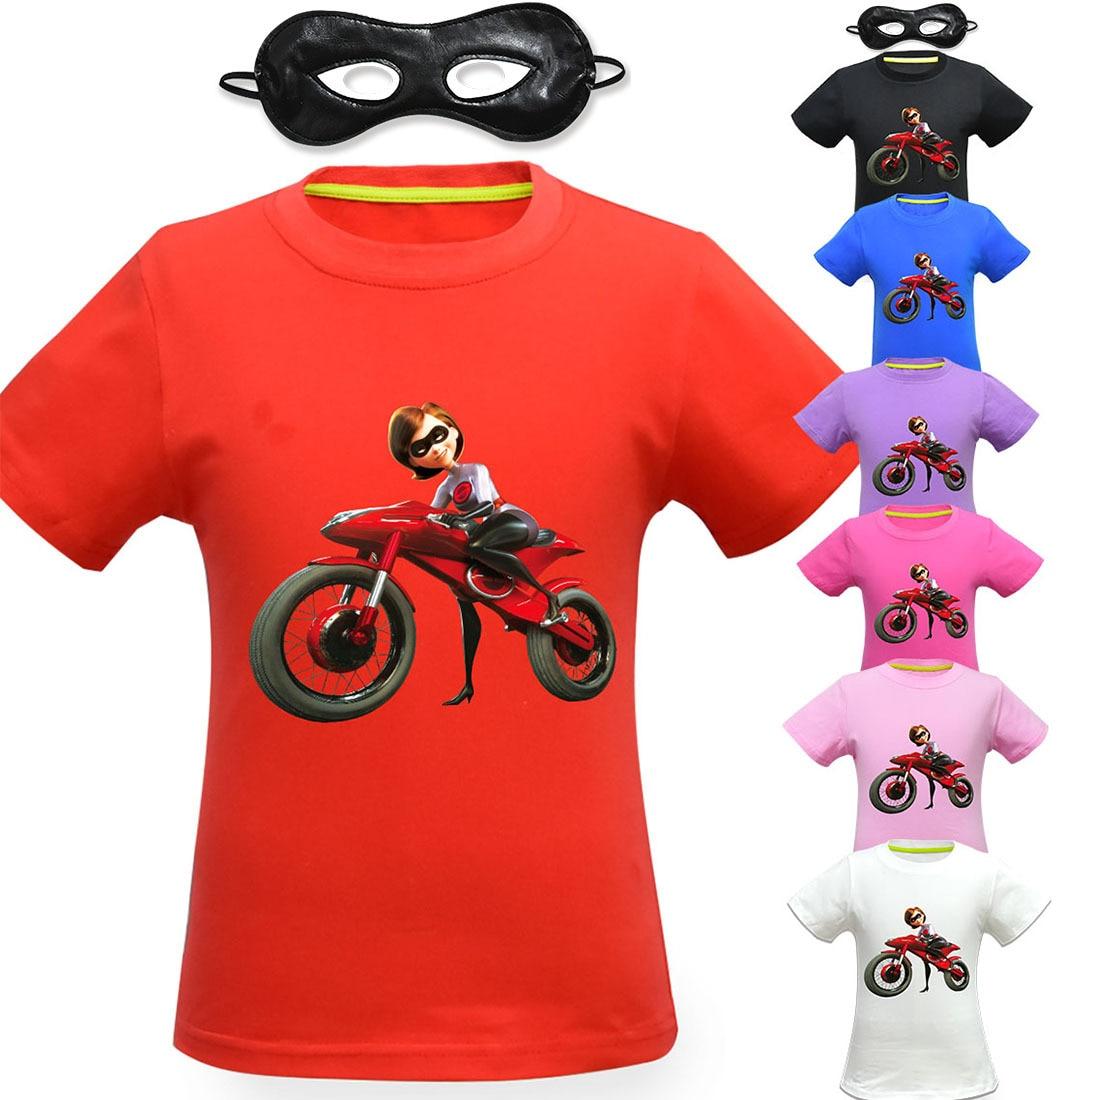 Kids The Incredibles 2 Hot Summer T-shirt Boy's Girl's Cartoon 3D T shirt Children's Top Tee Clothing Halloween Cosplay Costume